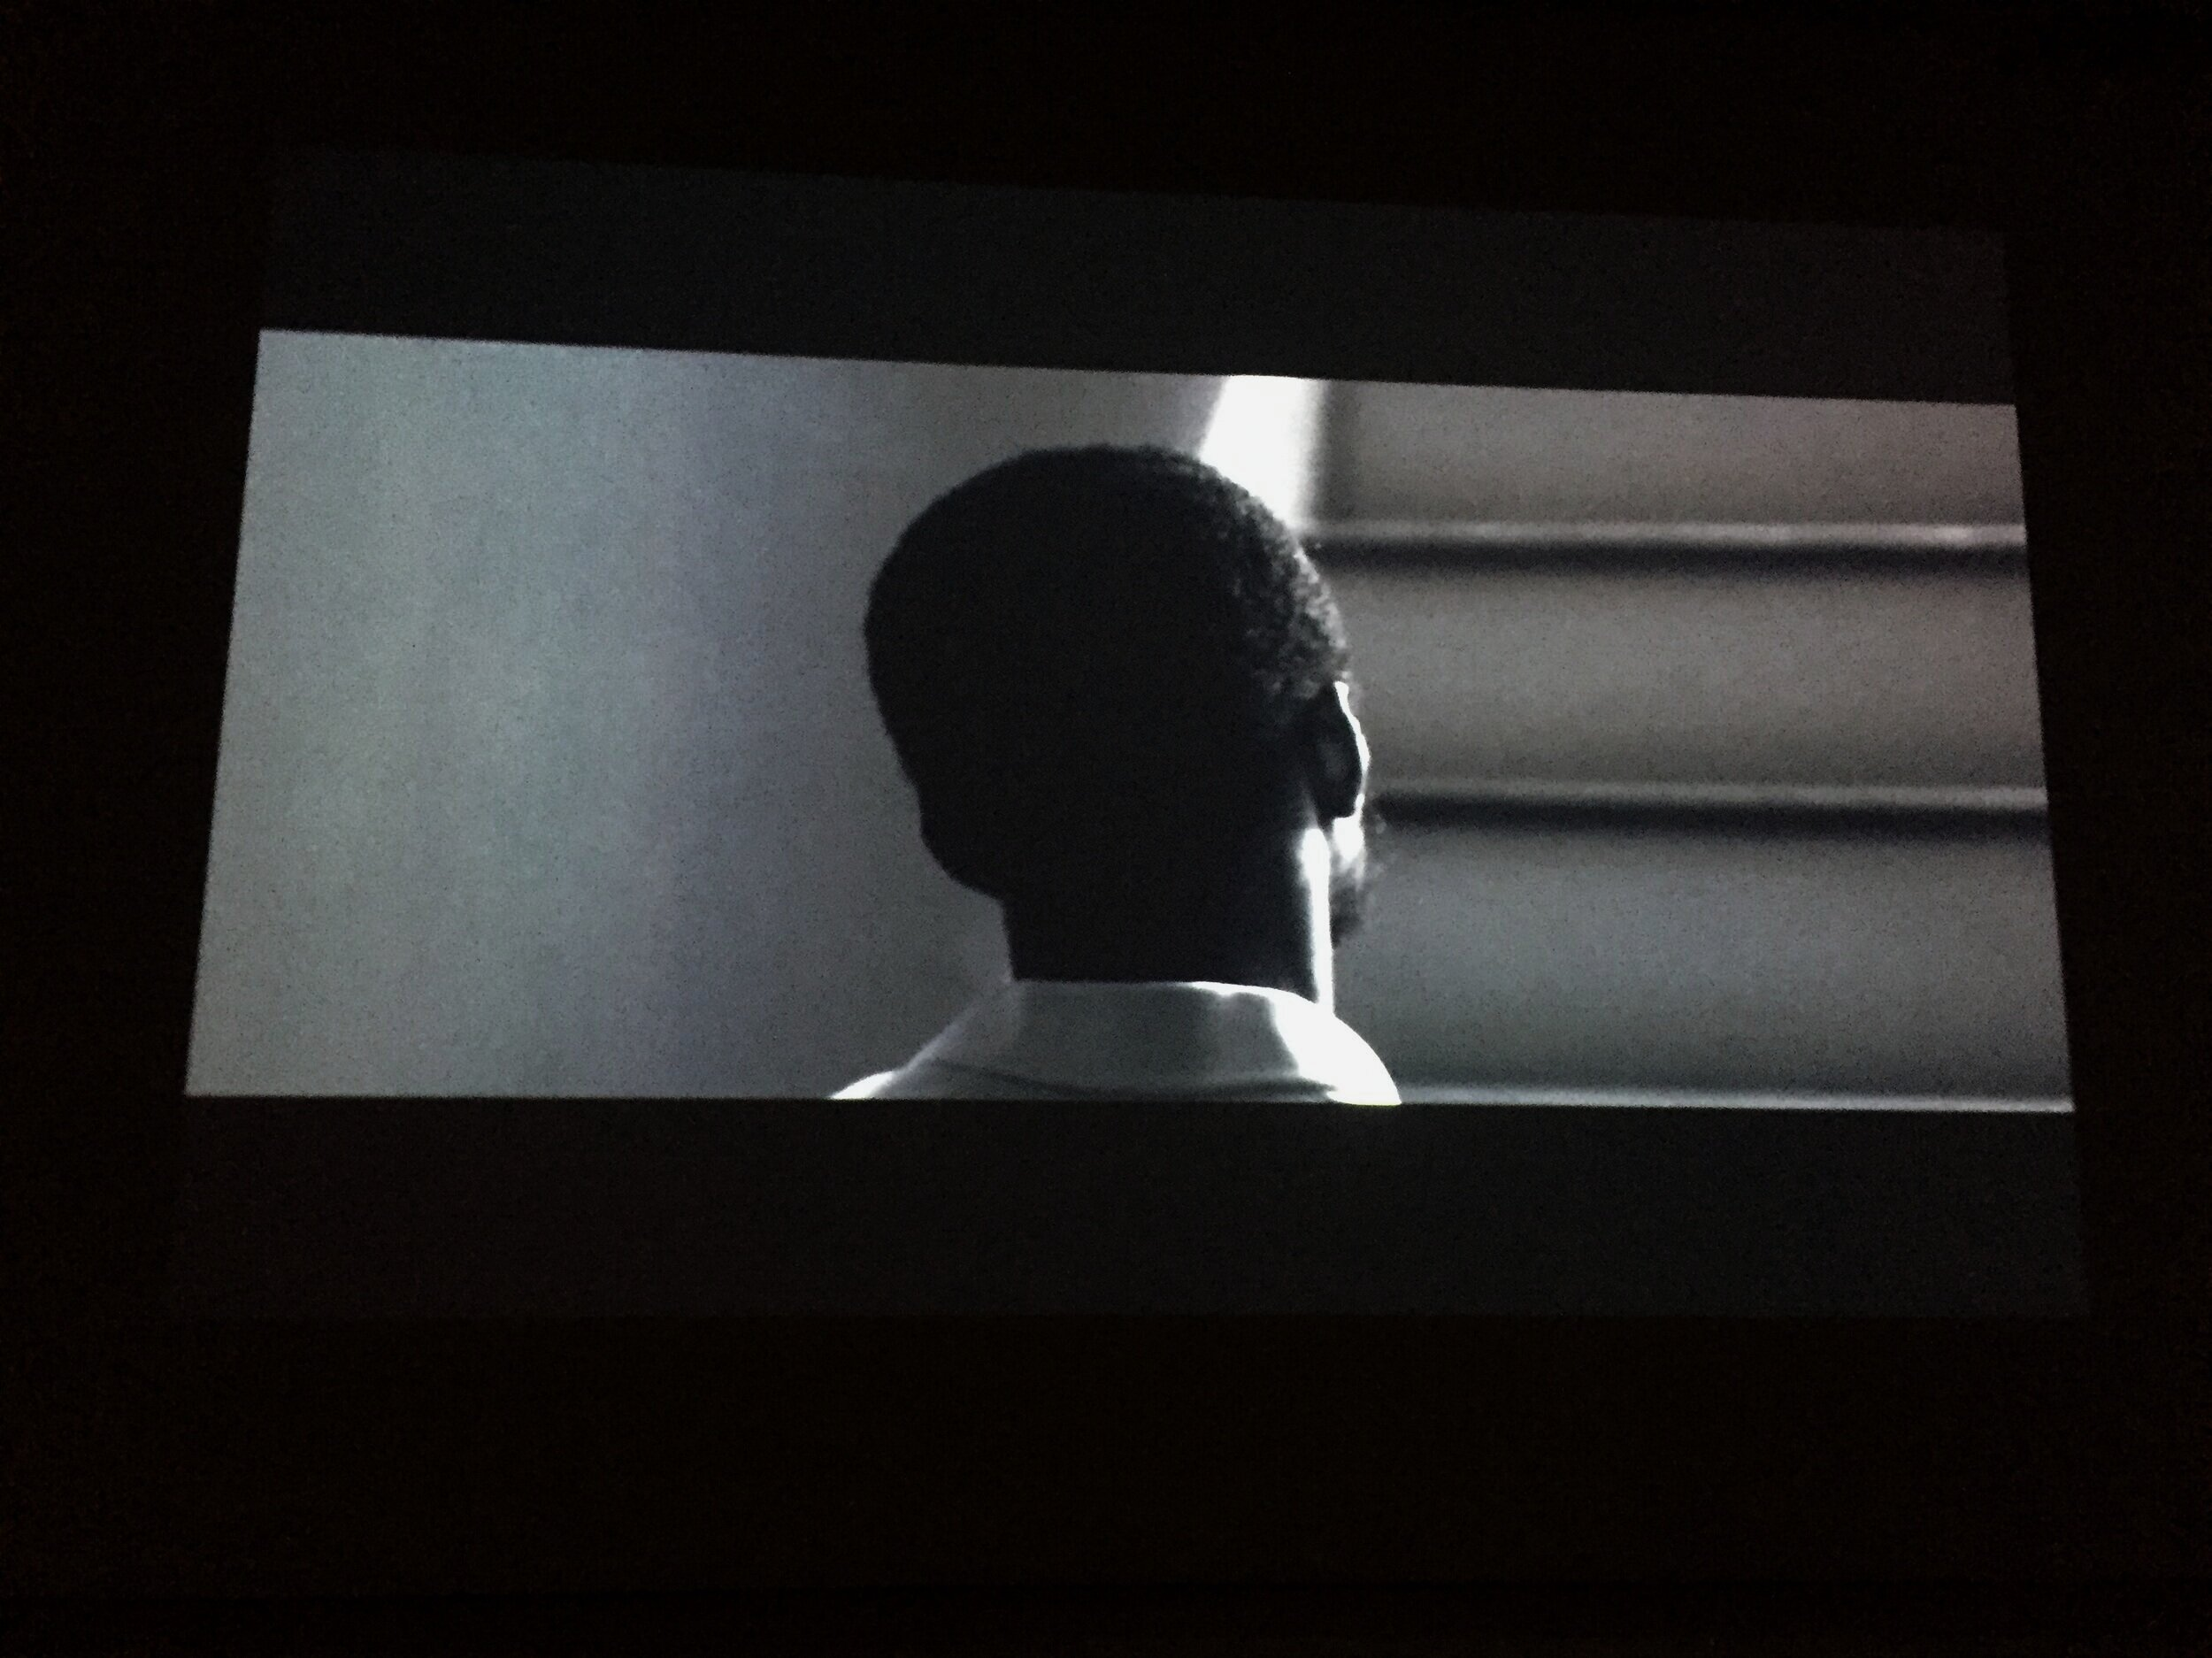 Video Still: On the Ground Sleeping, 2014  Untitled #70 screed in EBSPLOITATION, Martos Gallery       Untitled #70 screened in EBSPLOITATION, Martos Gallery